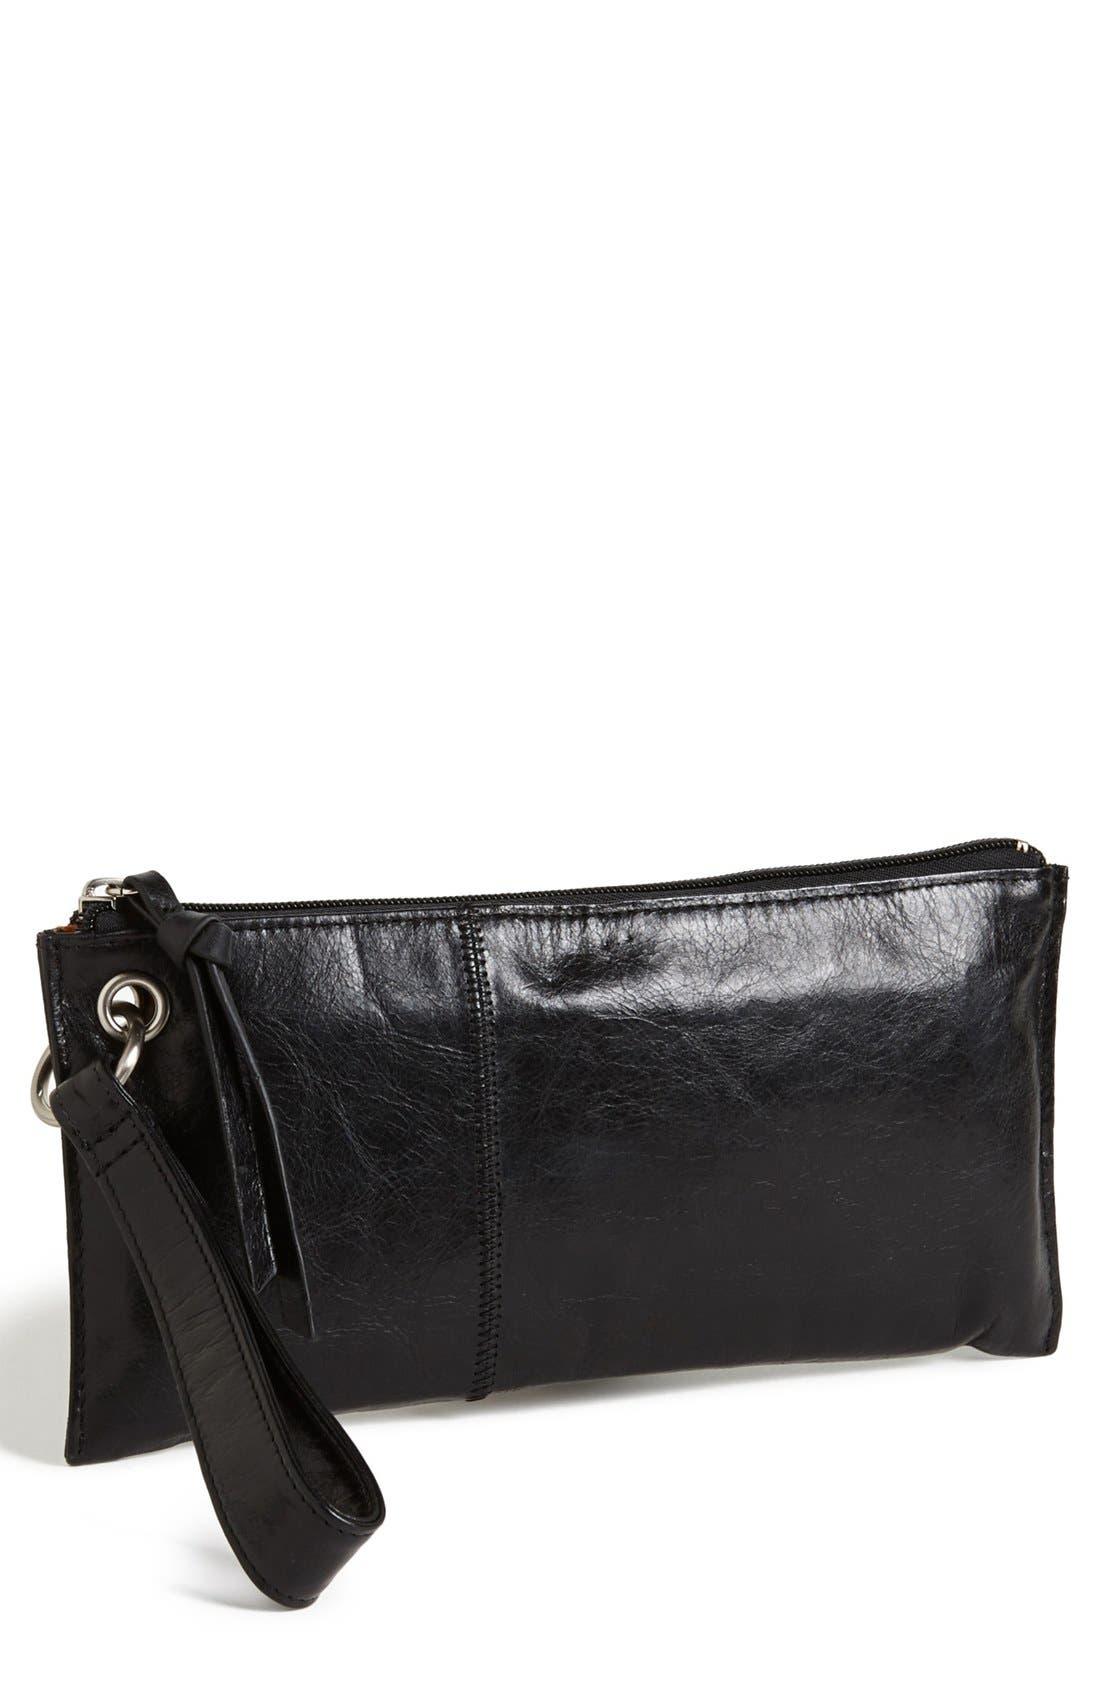 Main Image - Hobo 'Vida' Leather Clutch